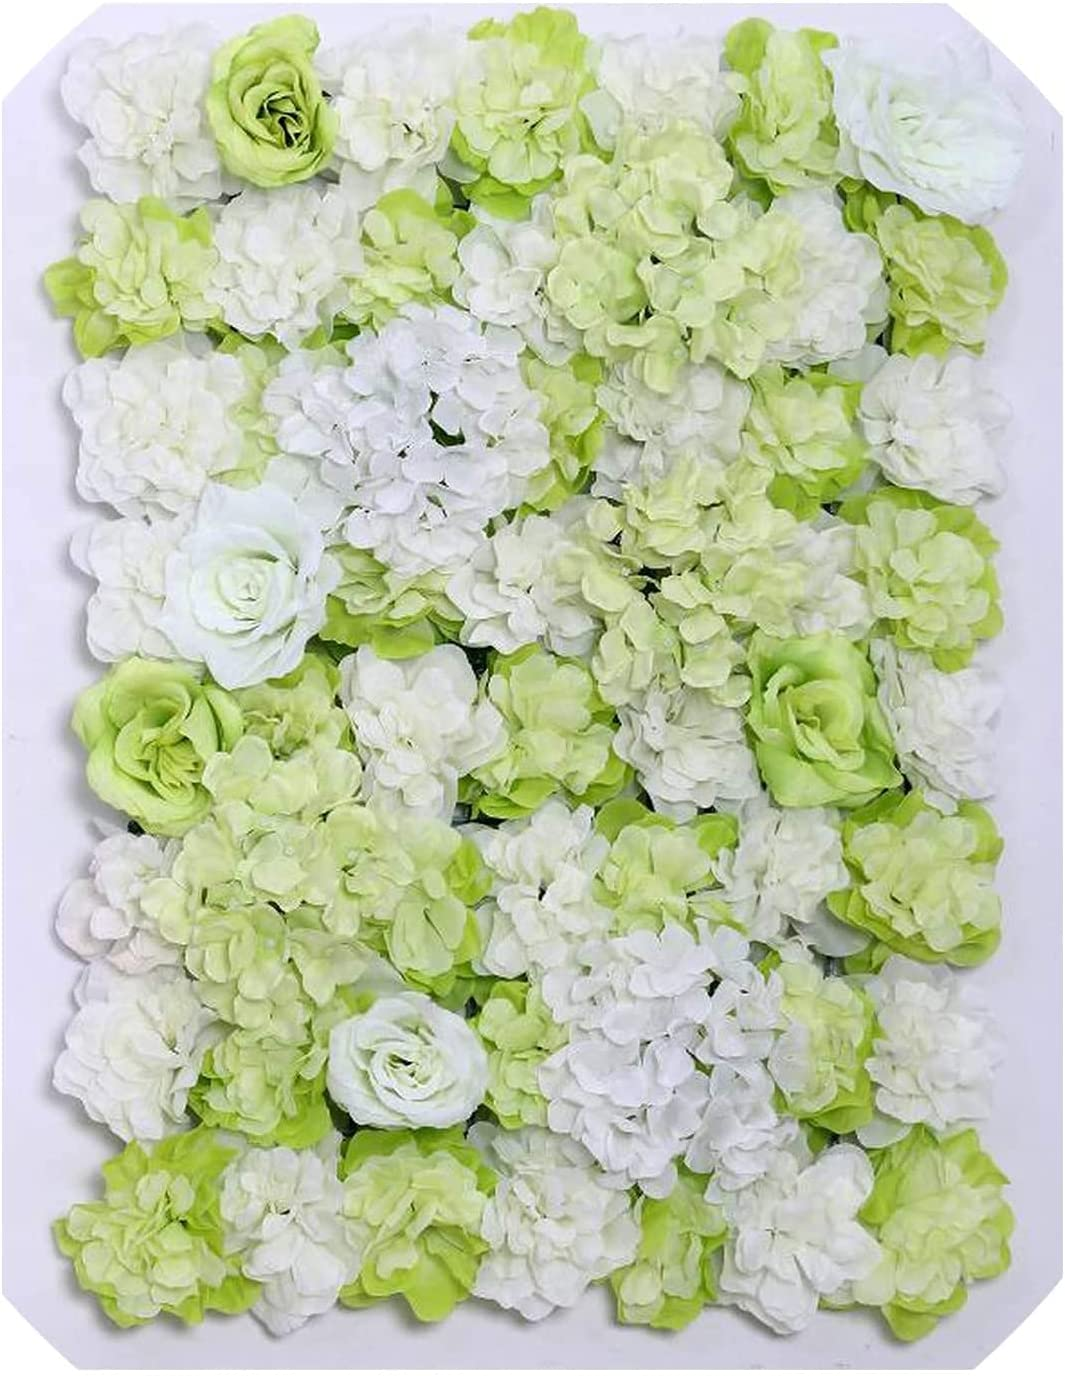 ARGYJAE Colorado Springs Mall 60x40cm Artificial Flower Wall Road Max 74% OFF Decoration Hydr Lead